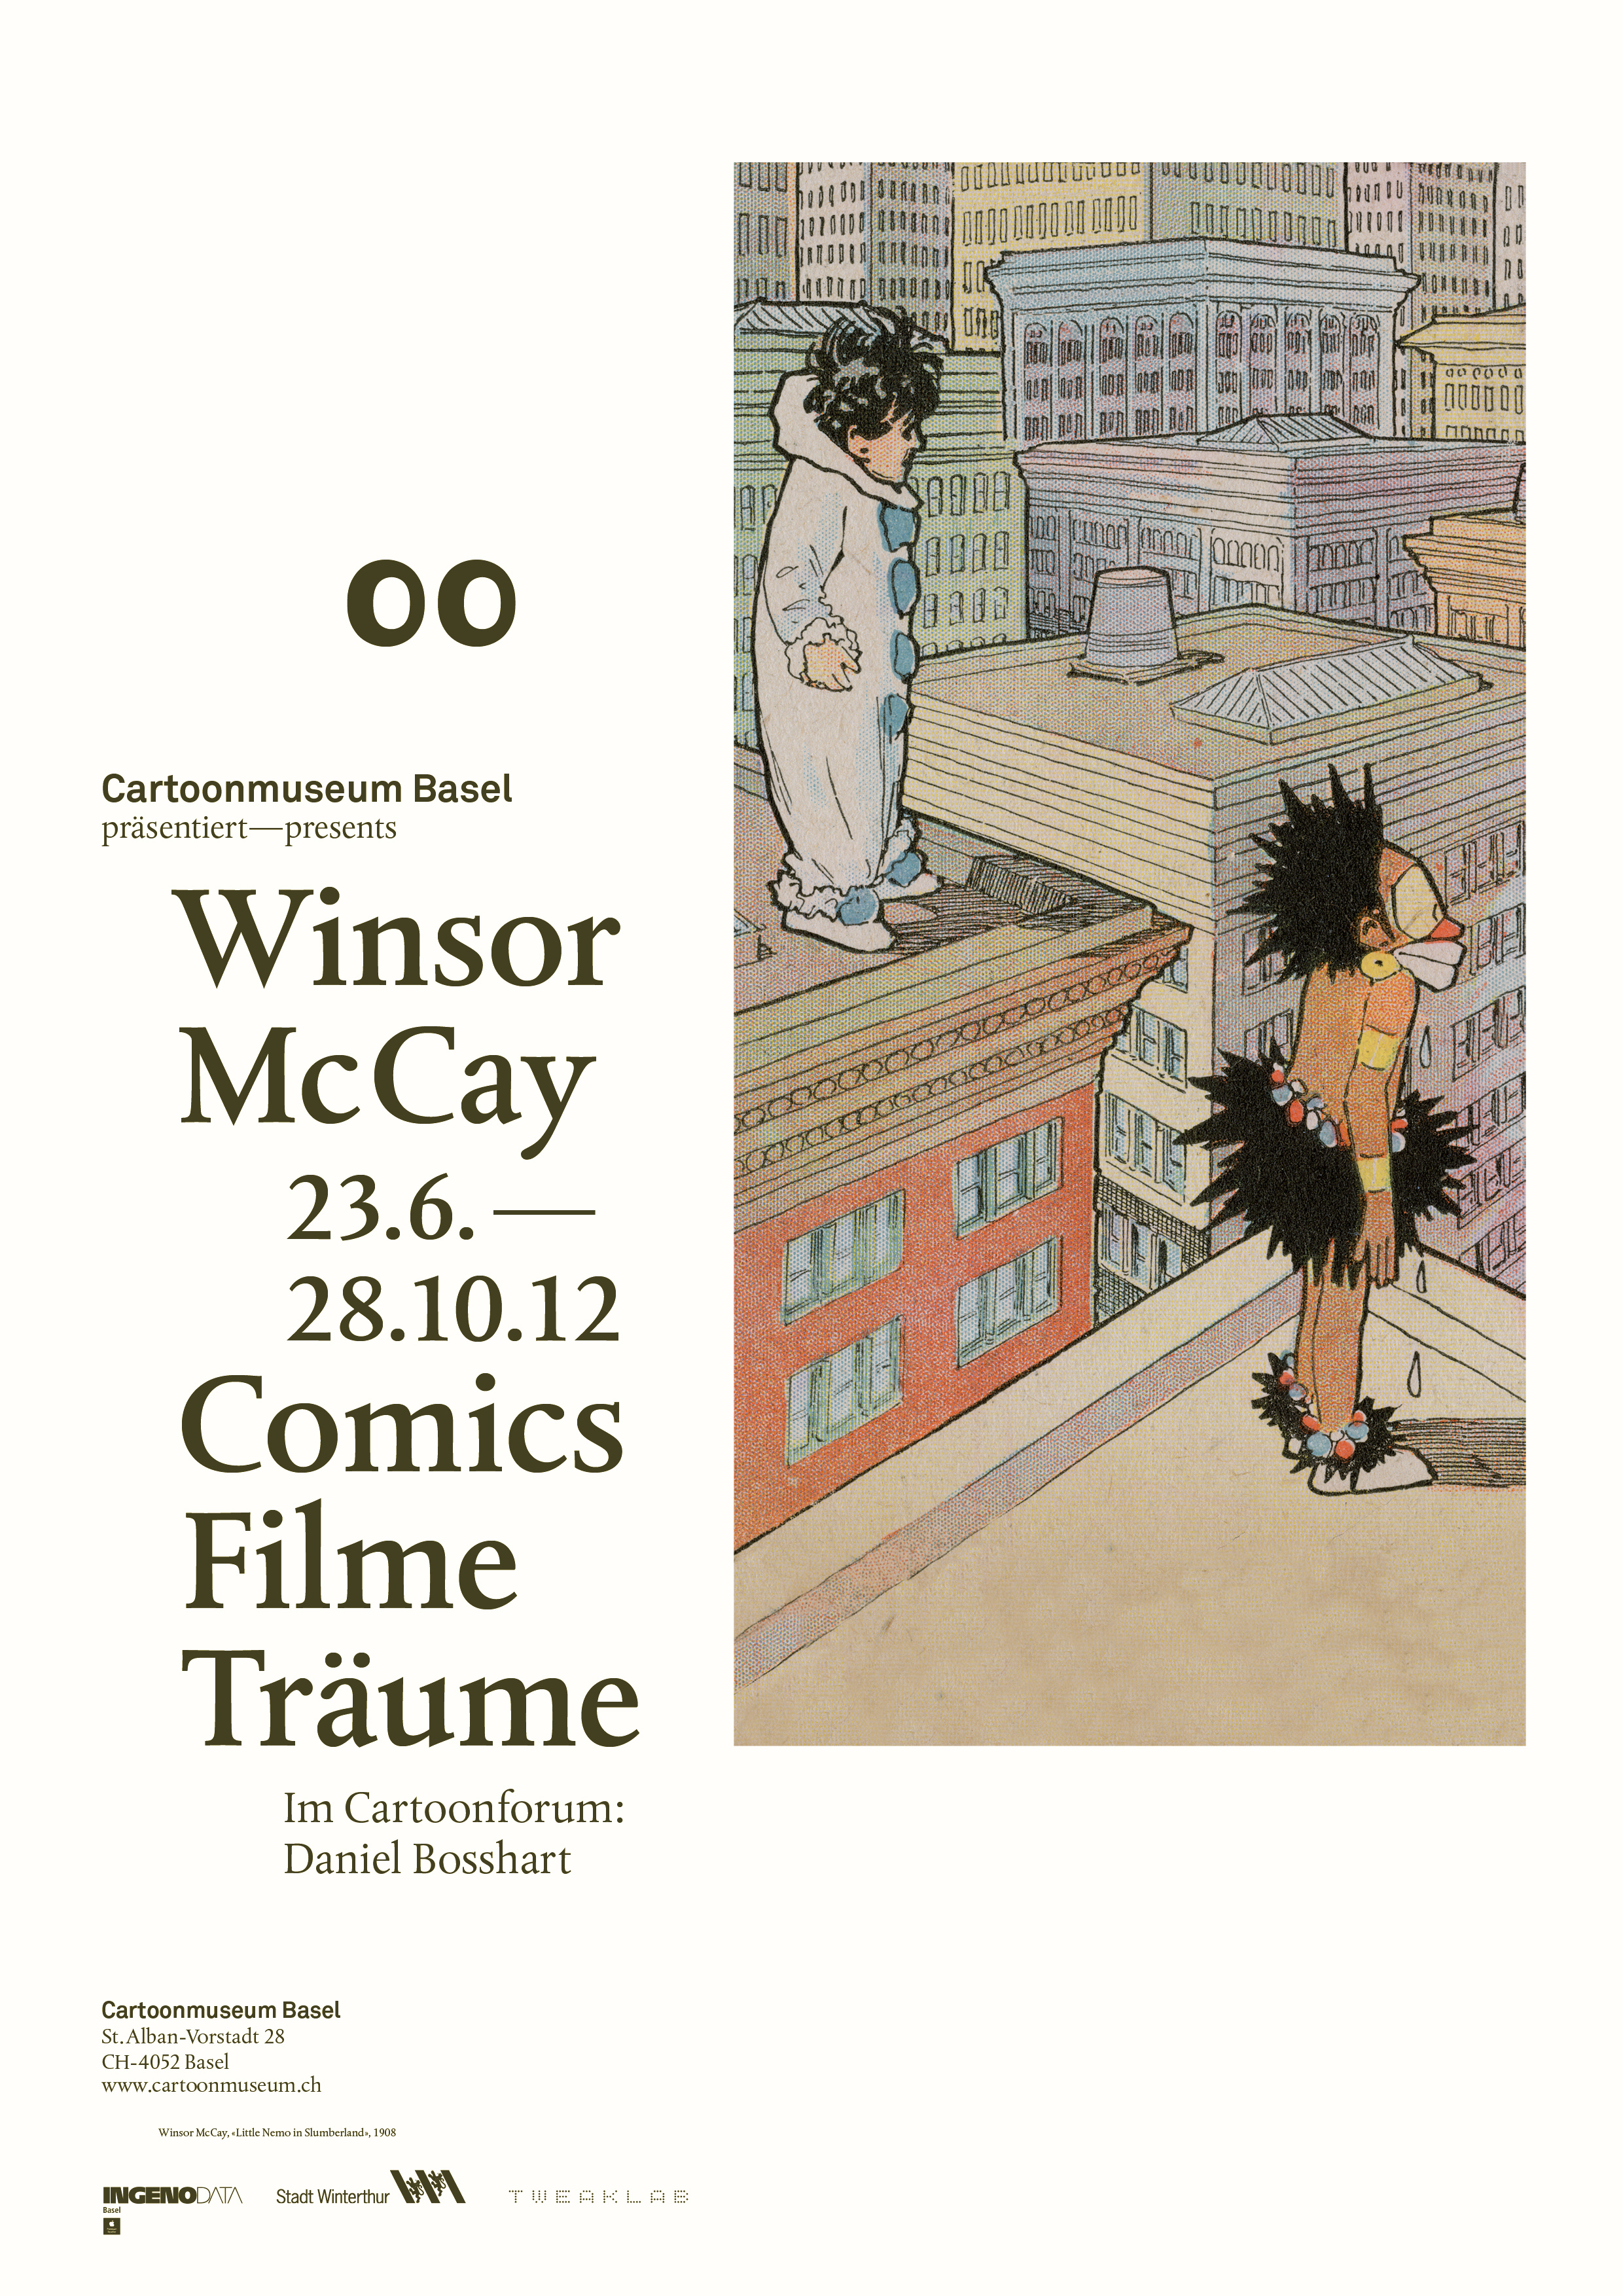 160203 Cartoon Alle Plakate Winsor McCay A410